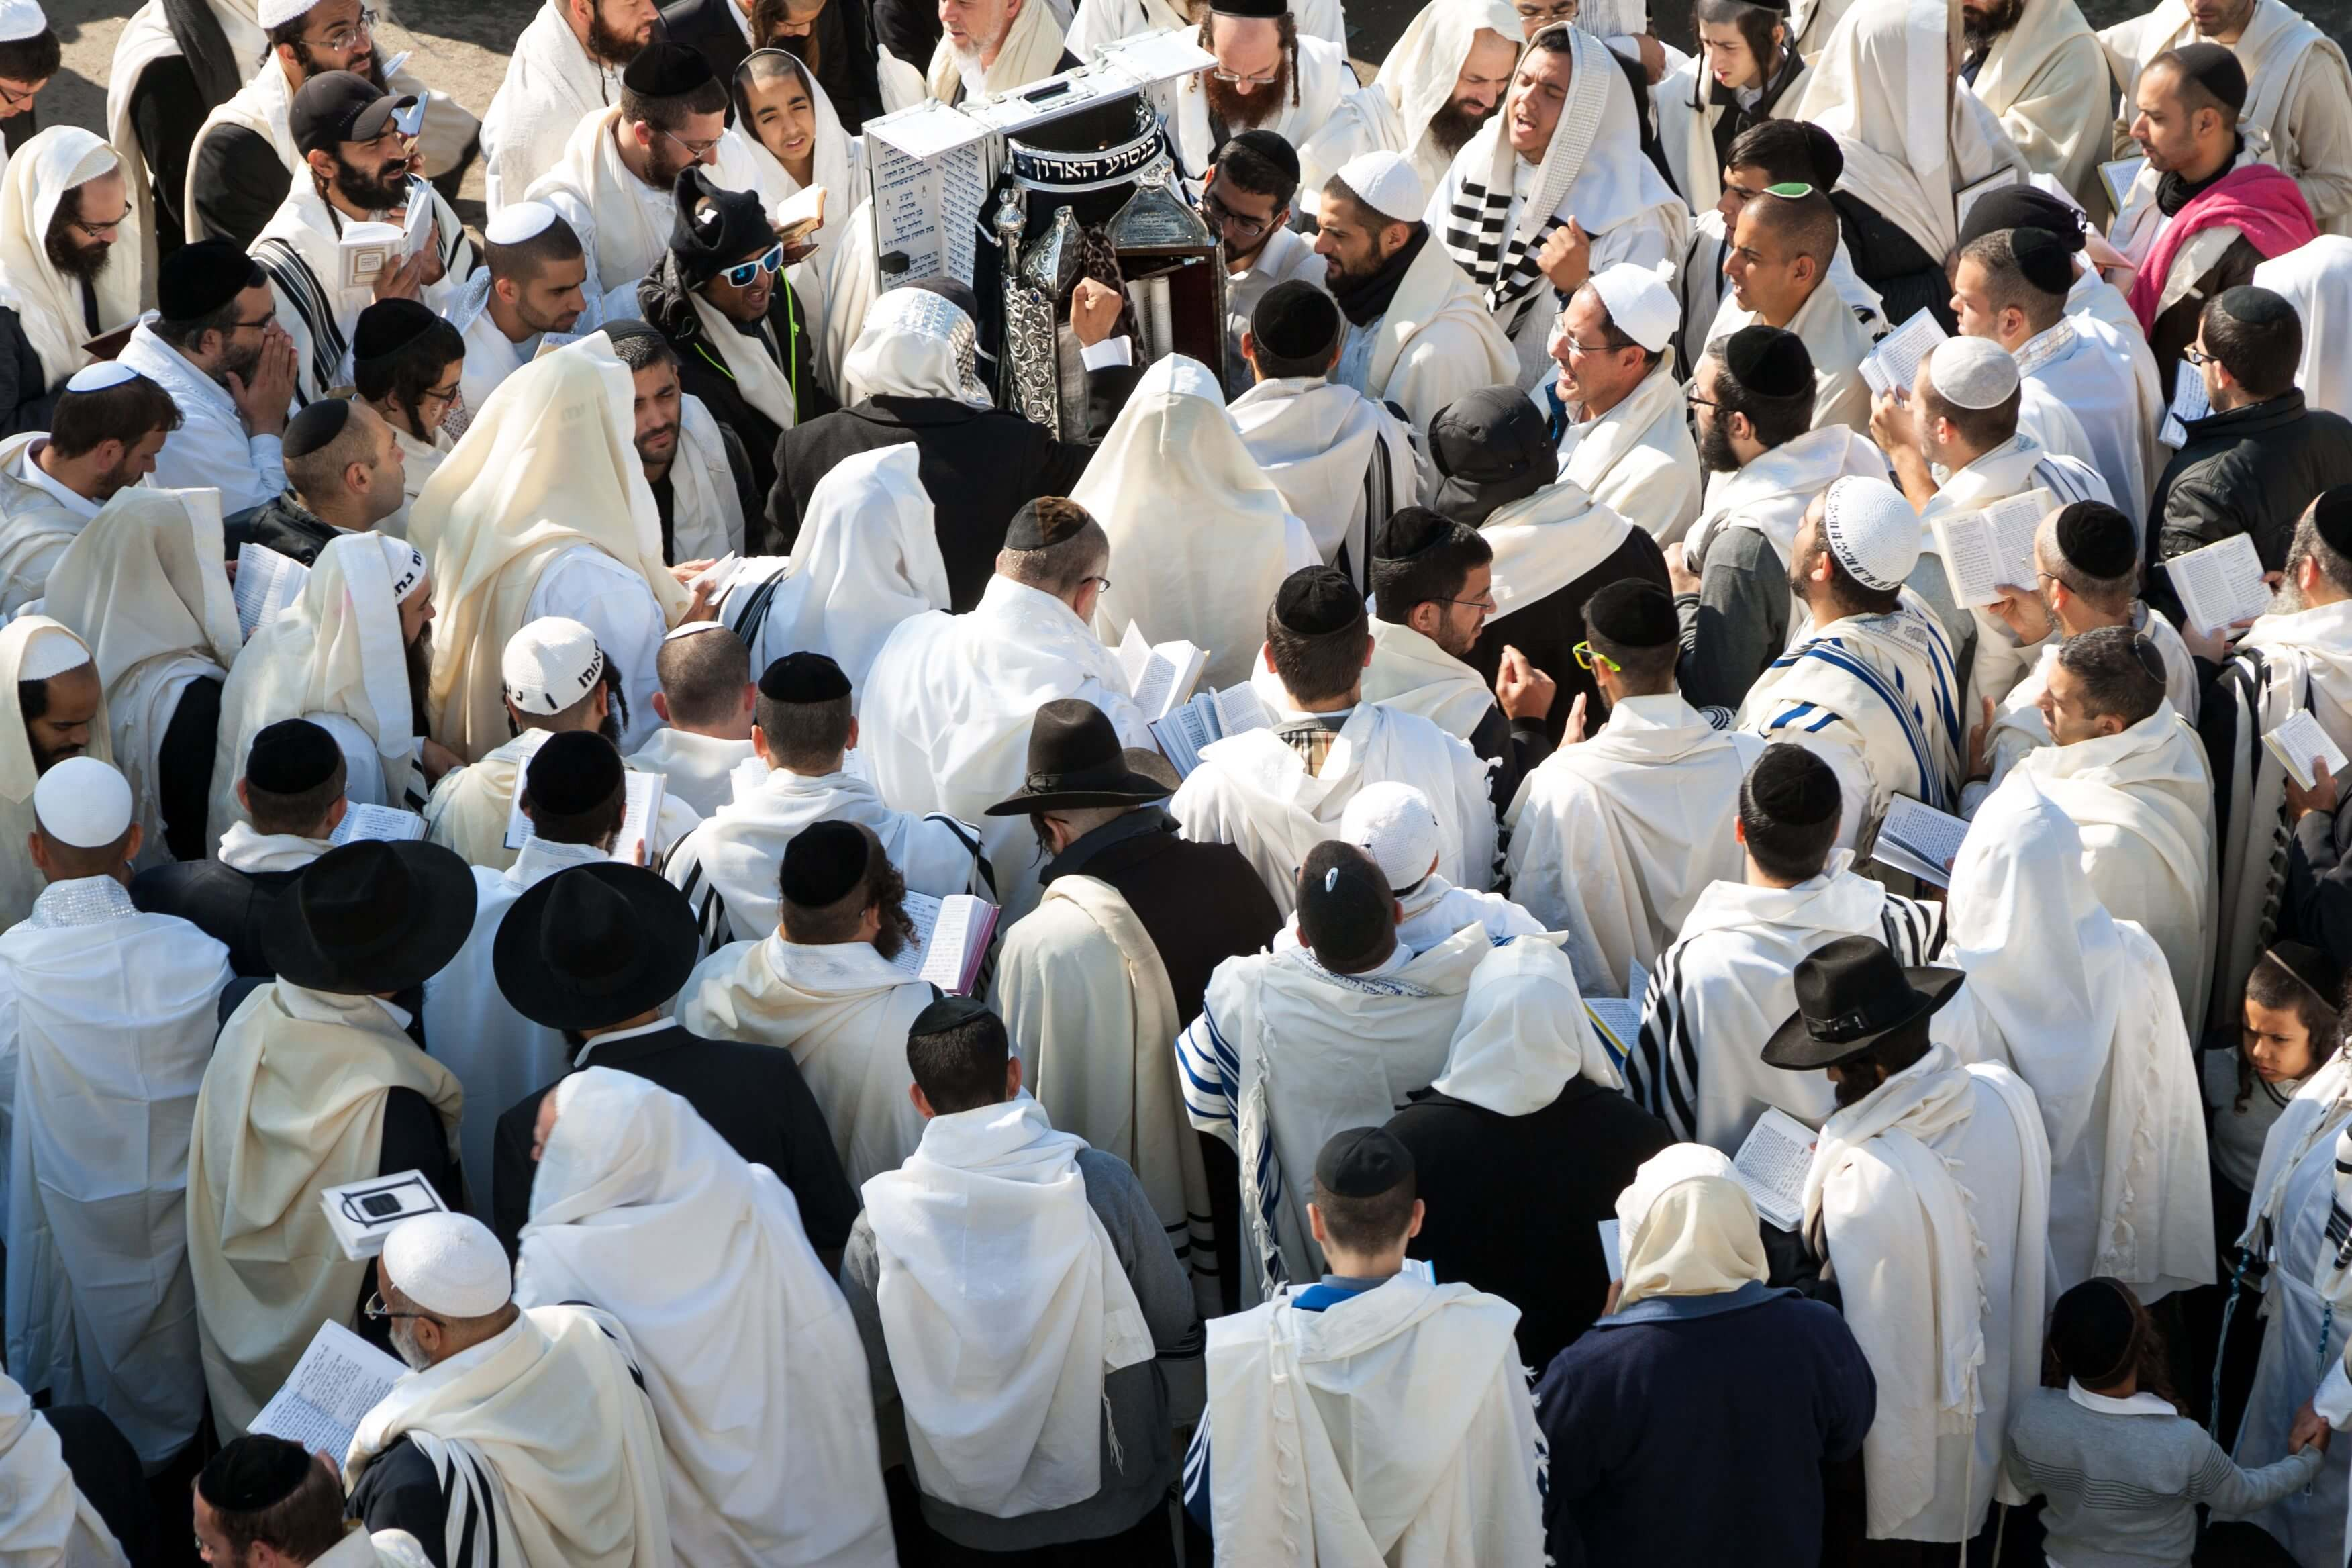 Thousands of Hasidic Jews came to Uman to celebrate Rosh Hashanah